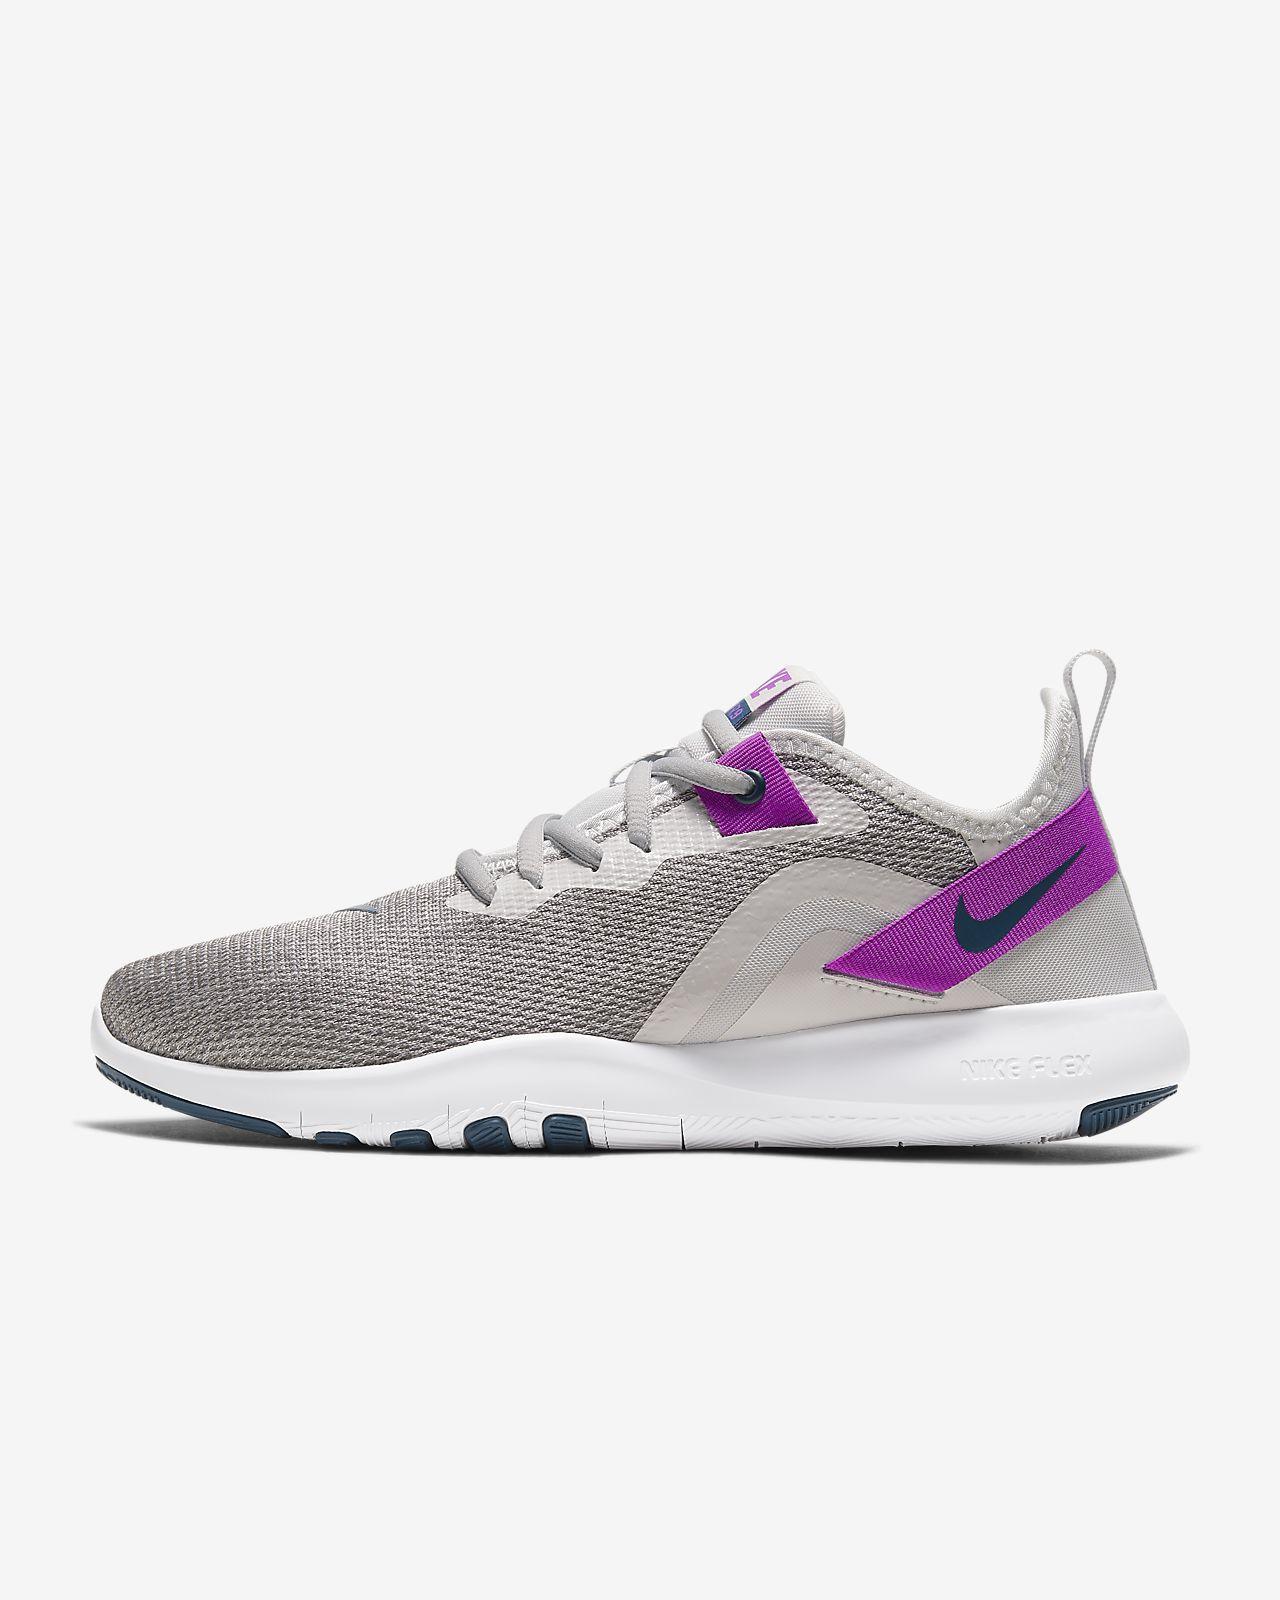 nike huarache white and purple, Nike Downshifter 6 Leather